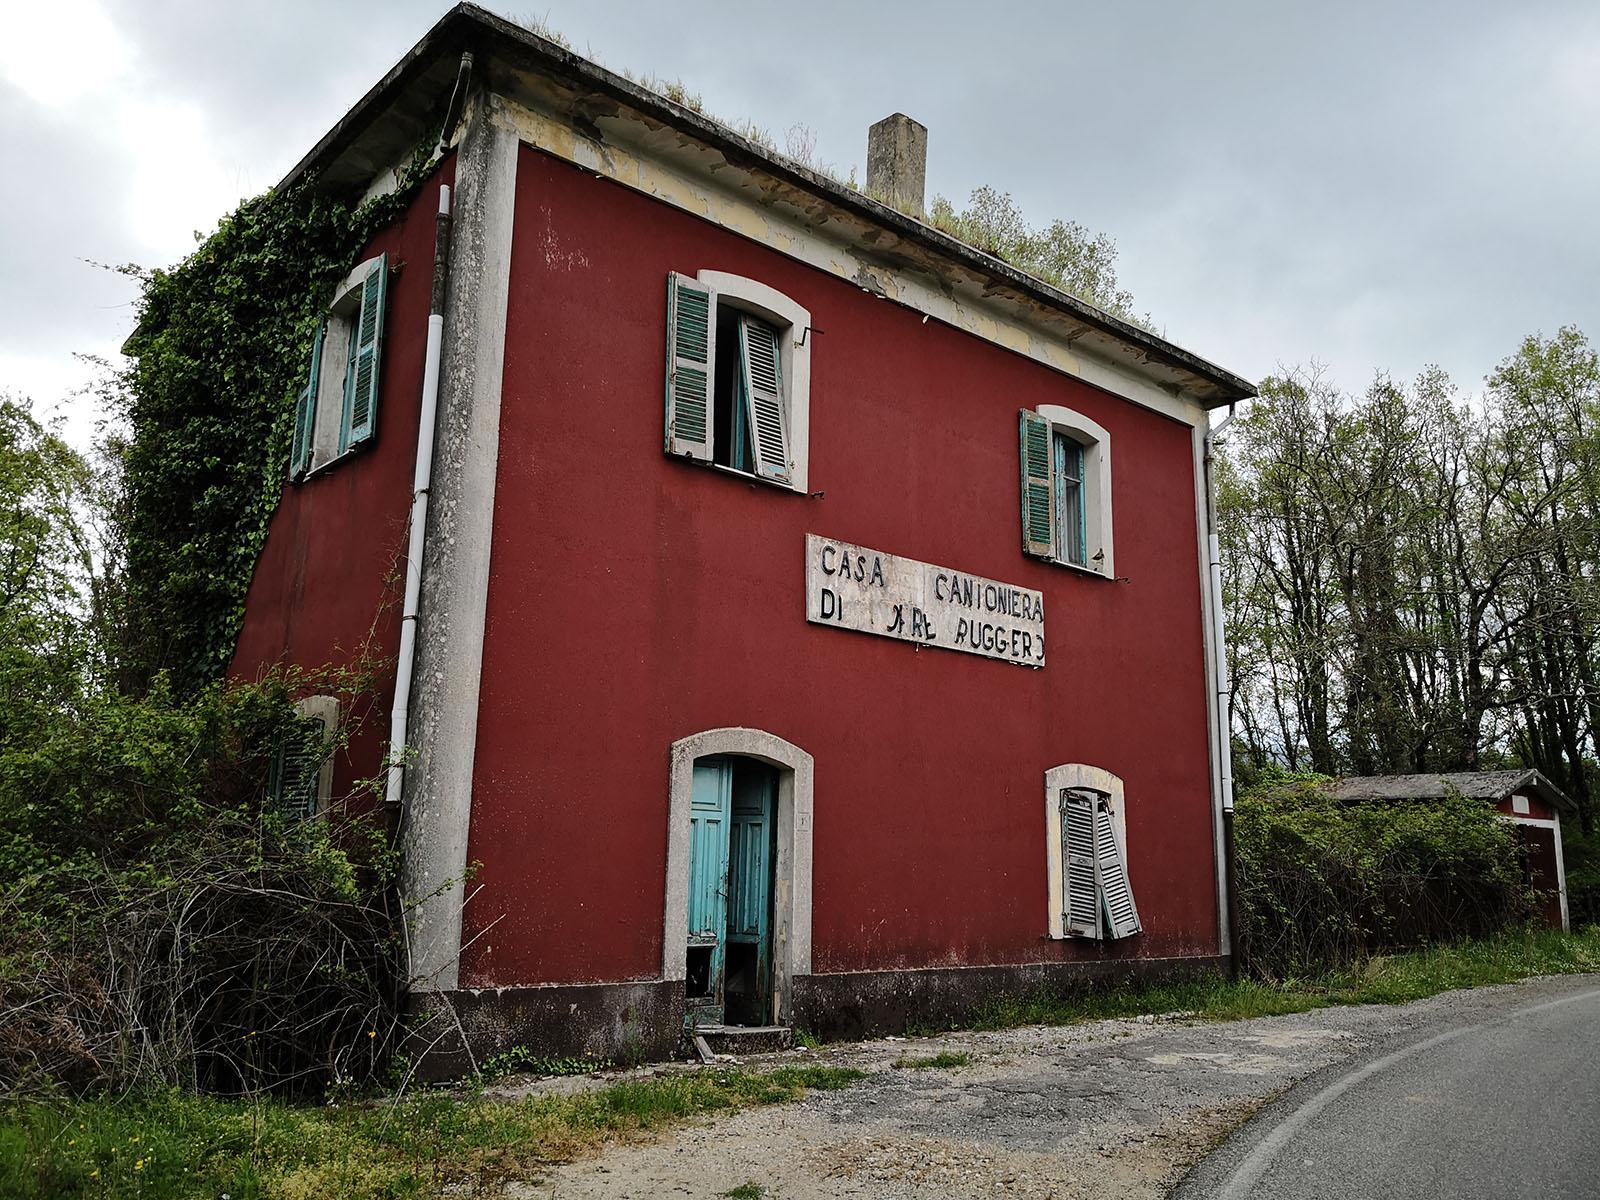 Torre di Ruggiero: Casa Cantoniera